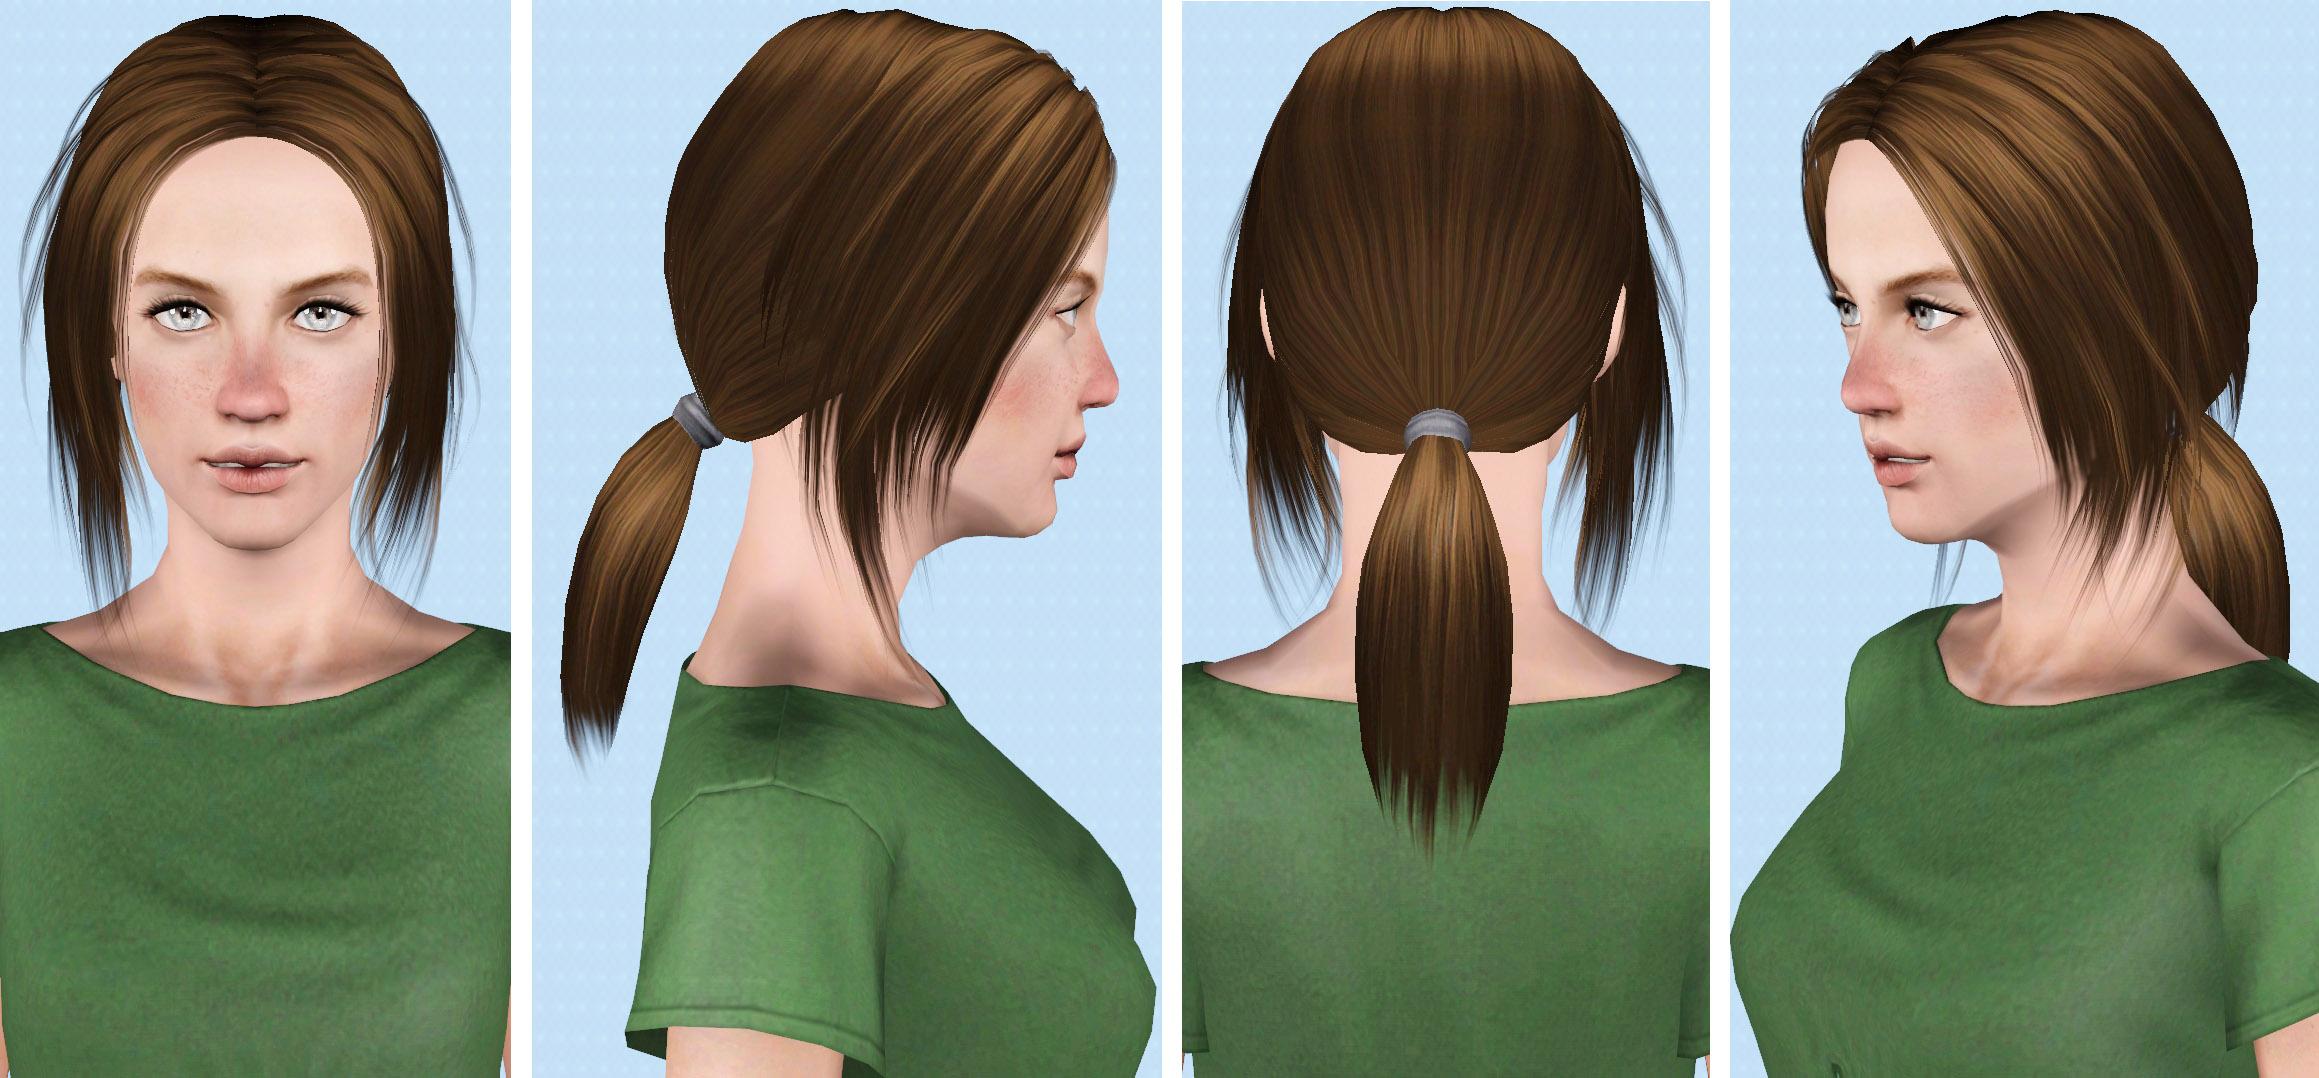 Mod The Sims Moonlight Female Hair Teen To Elder